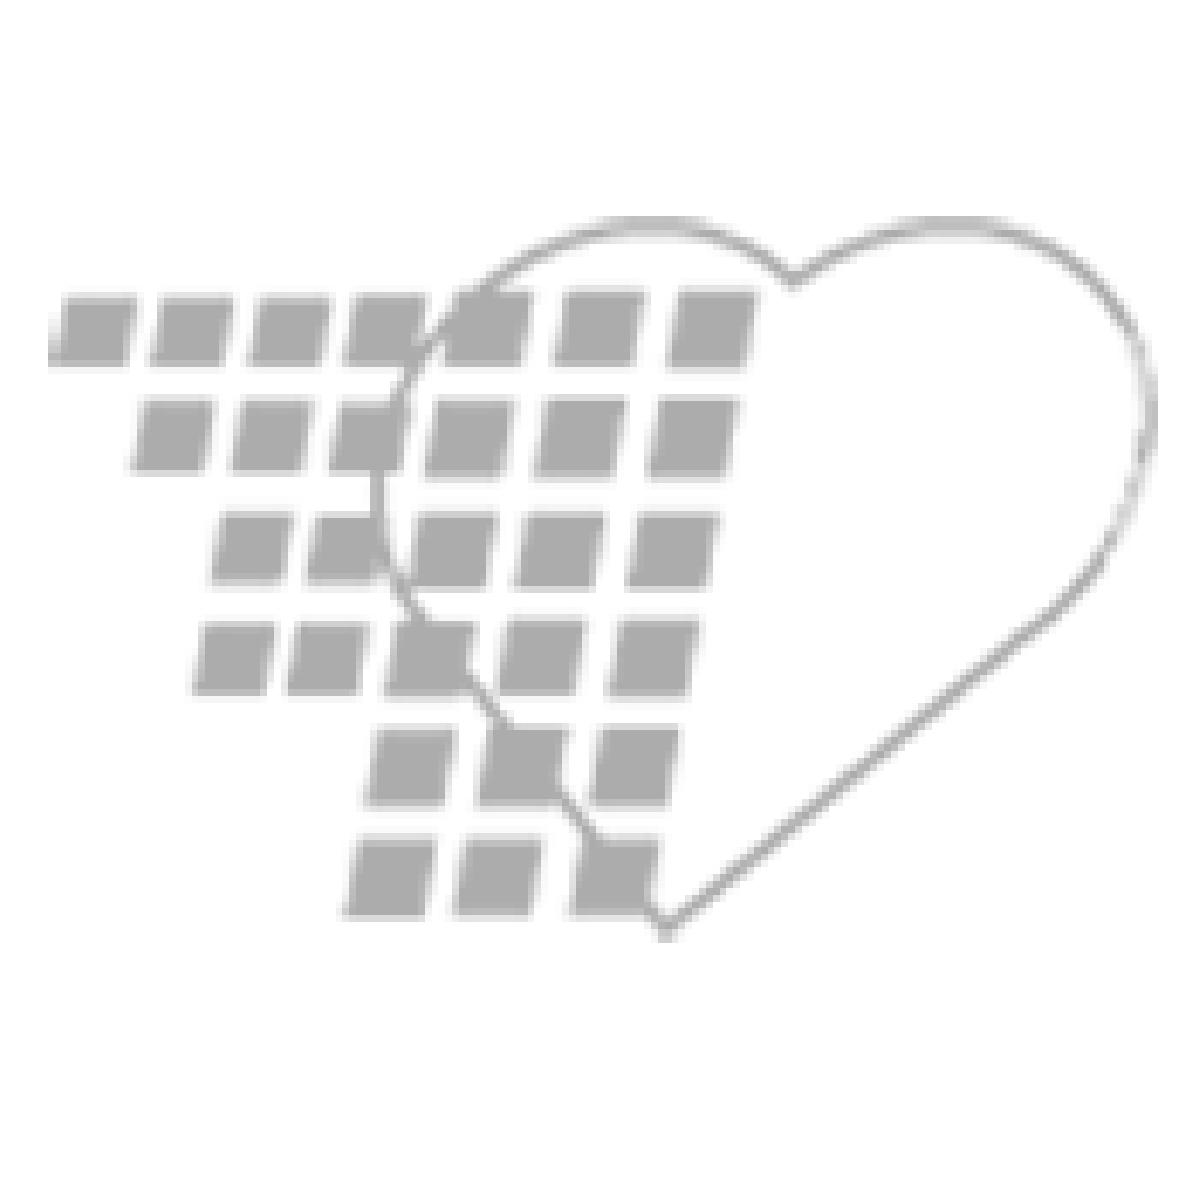 02-70-4070-CHLD - Satin   MacIntosh Blade #2